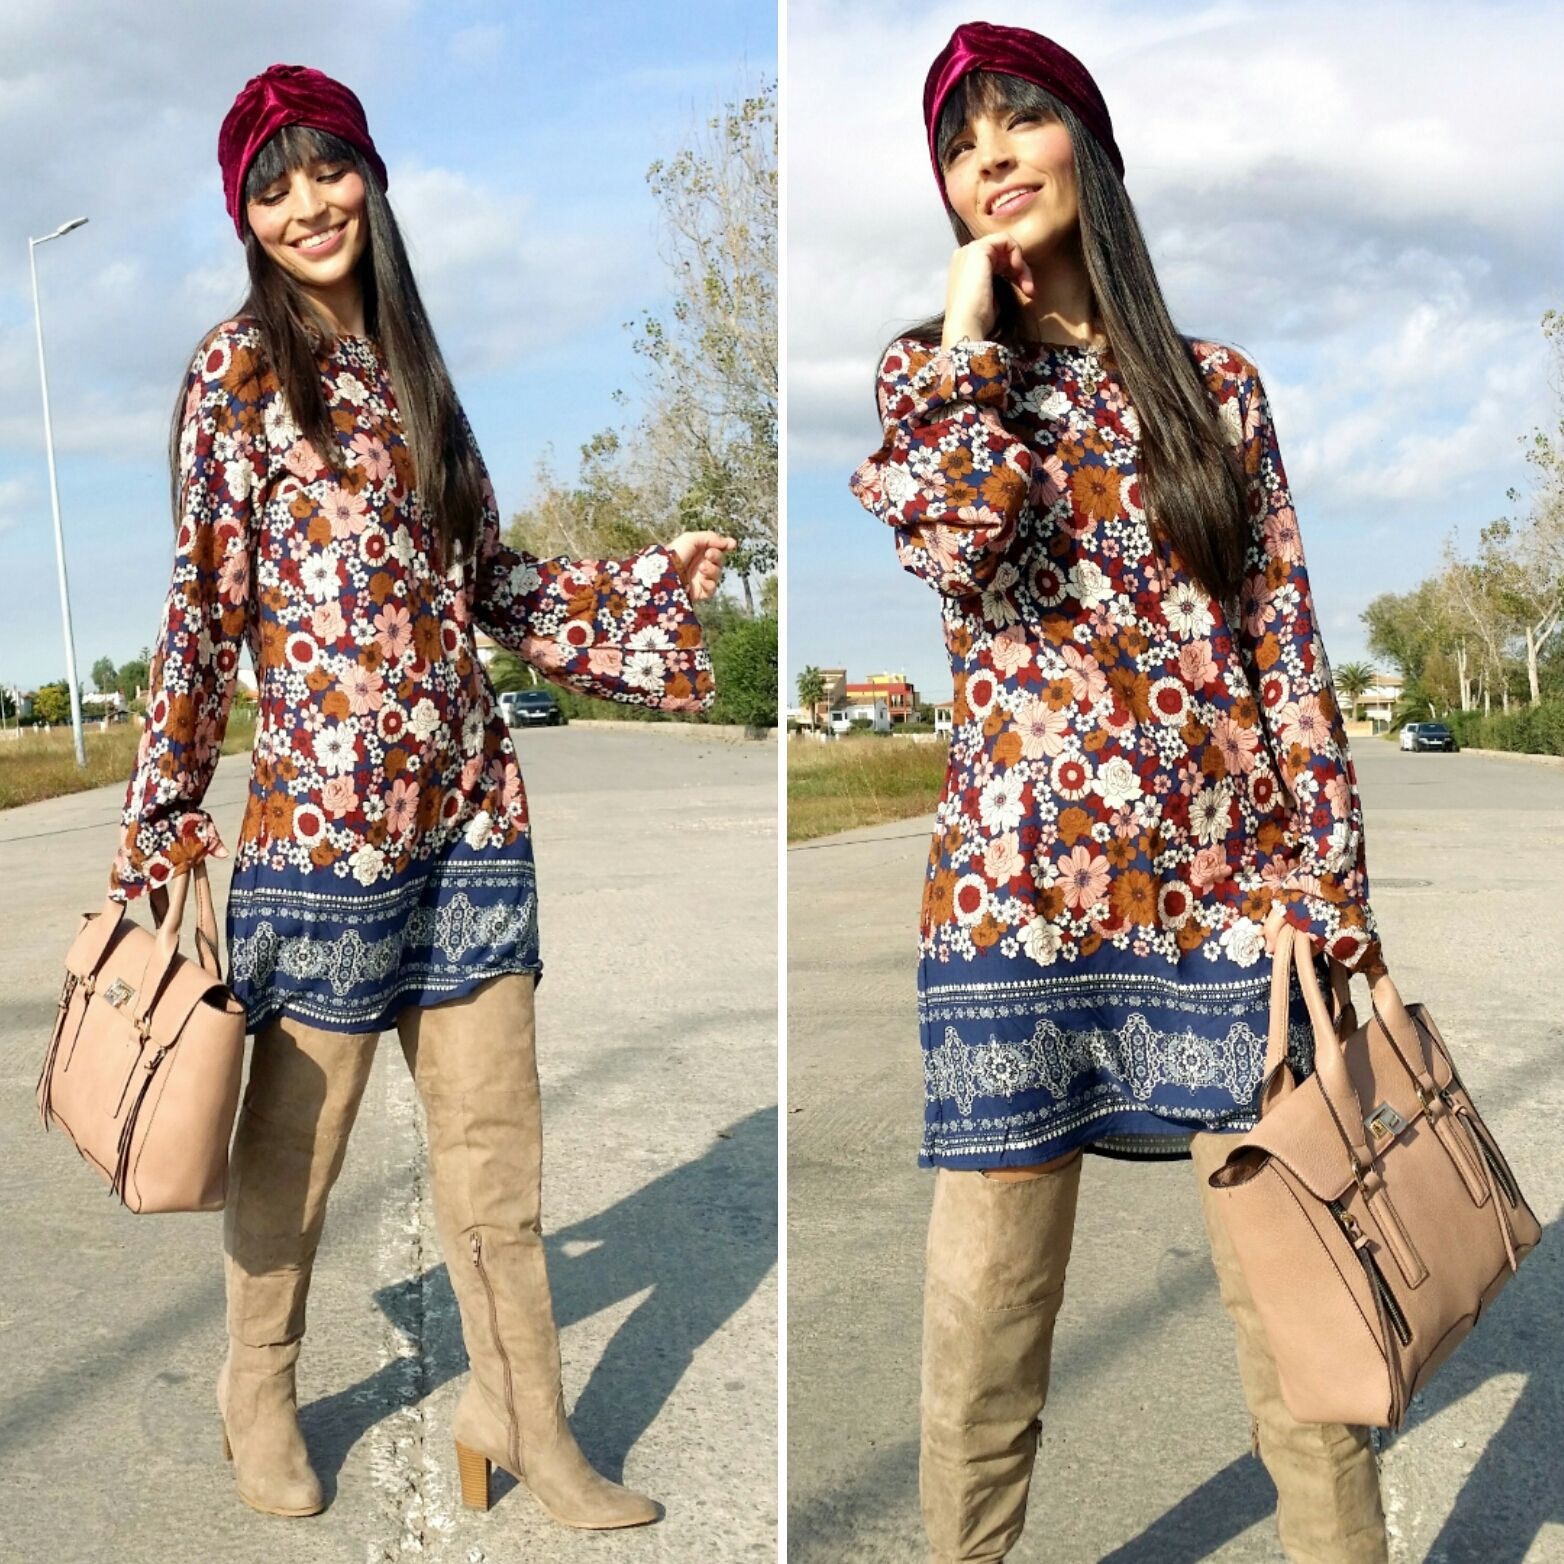 turbante velvet - Temporada: Otoño-Invierno - Tags: look, ootd, fashion, moda, stardivariusblog, blogger - Descripción: look boho